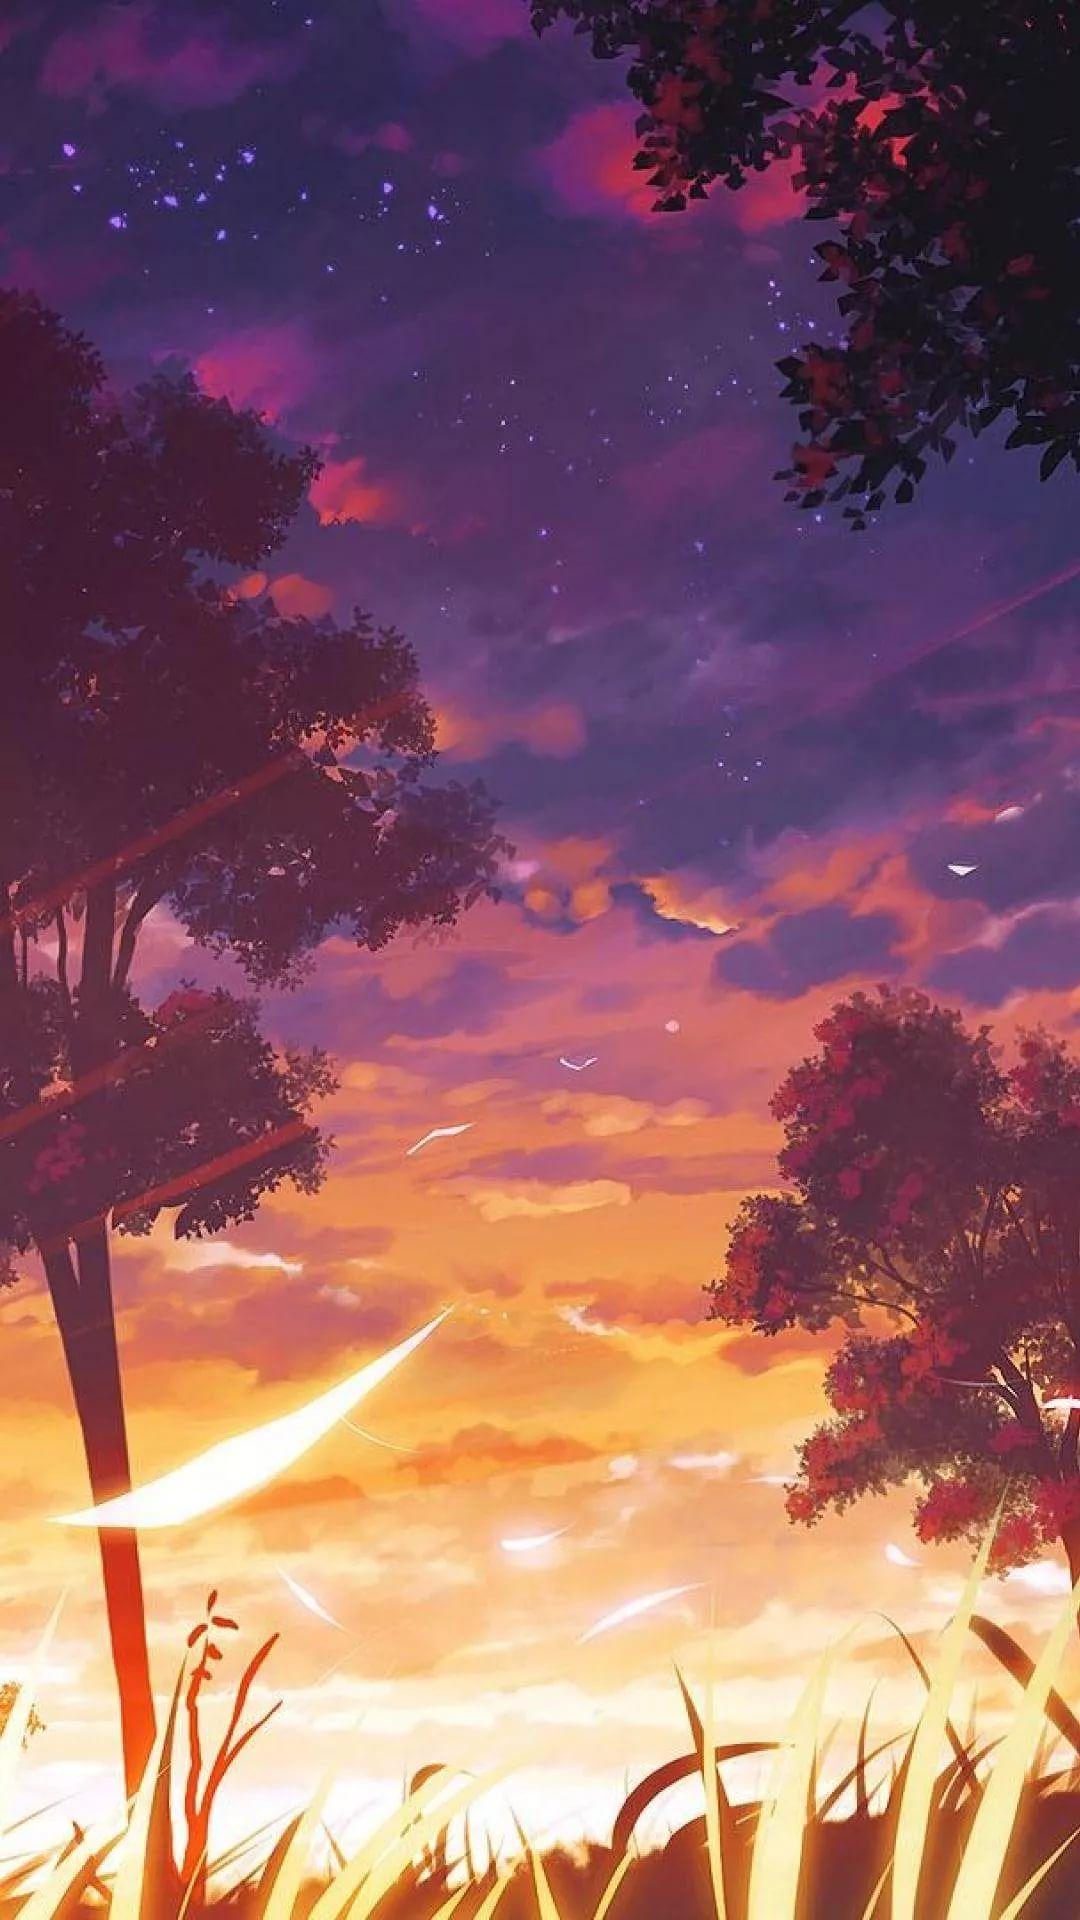 Sad Anime wallpaper for my phone